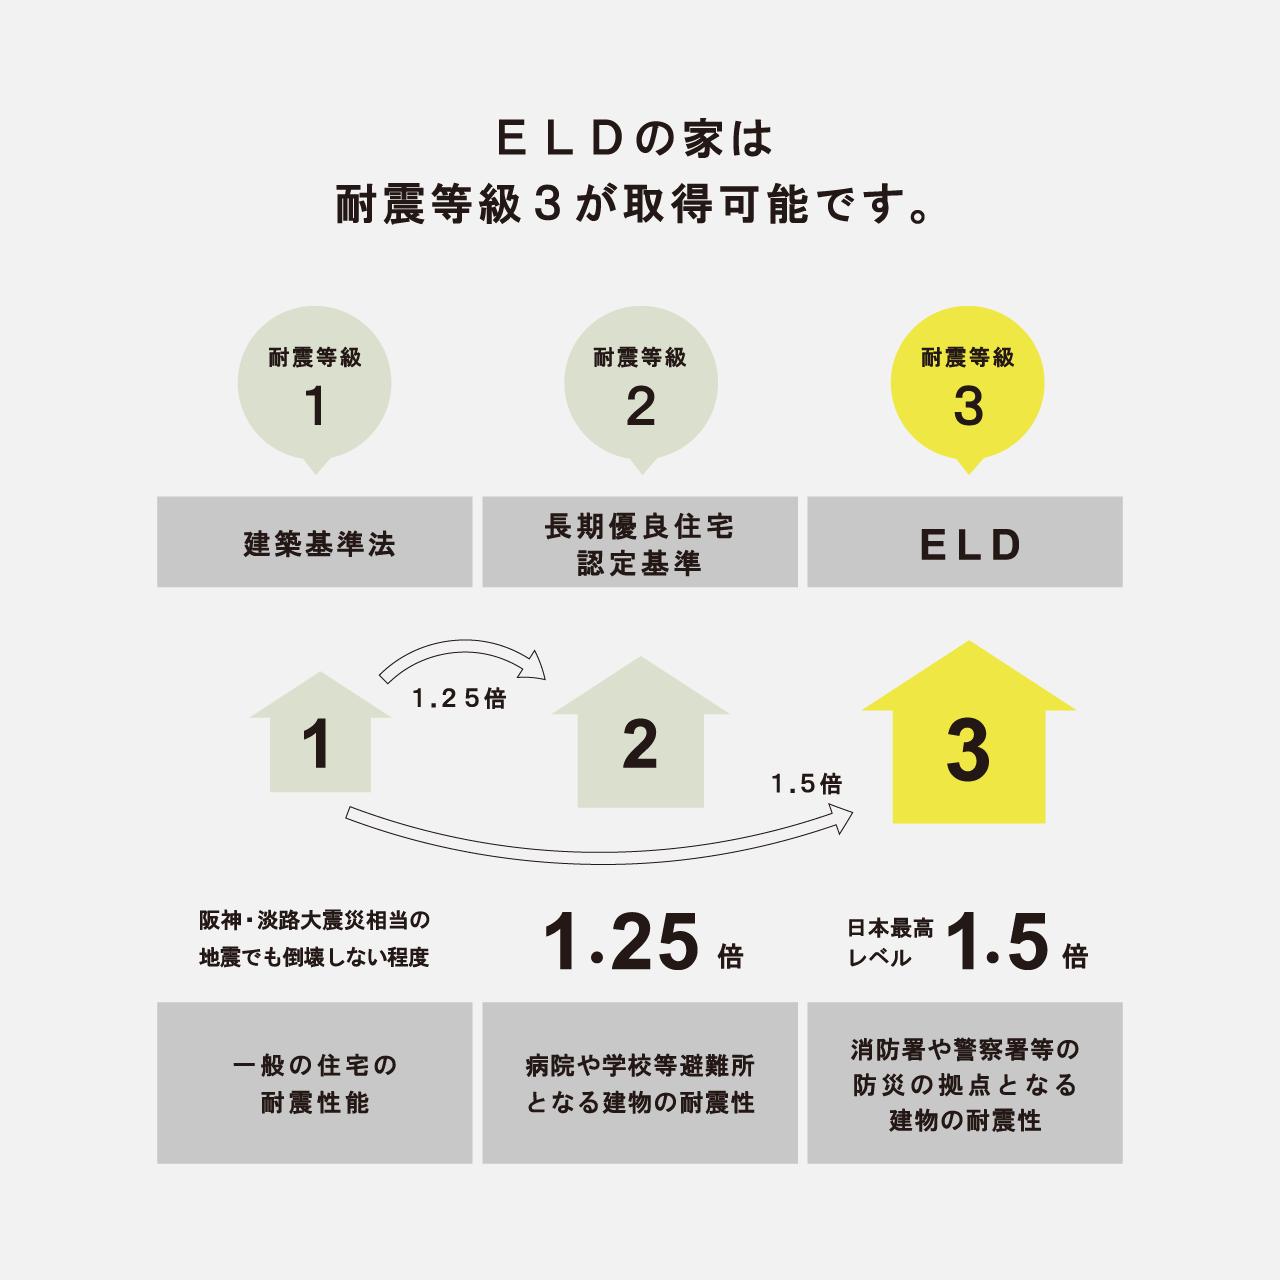 ELDの家は耐震等級3が取得可能です。